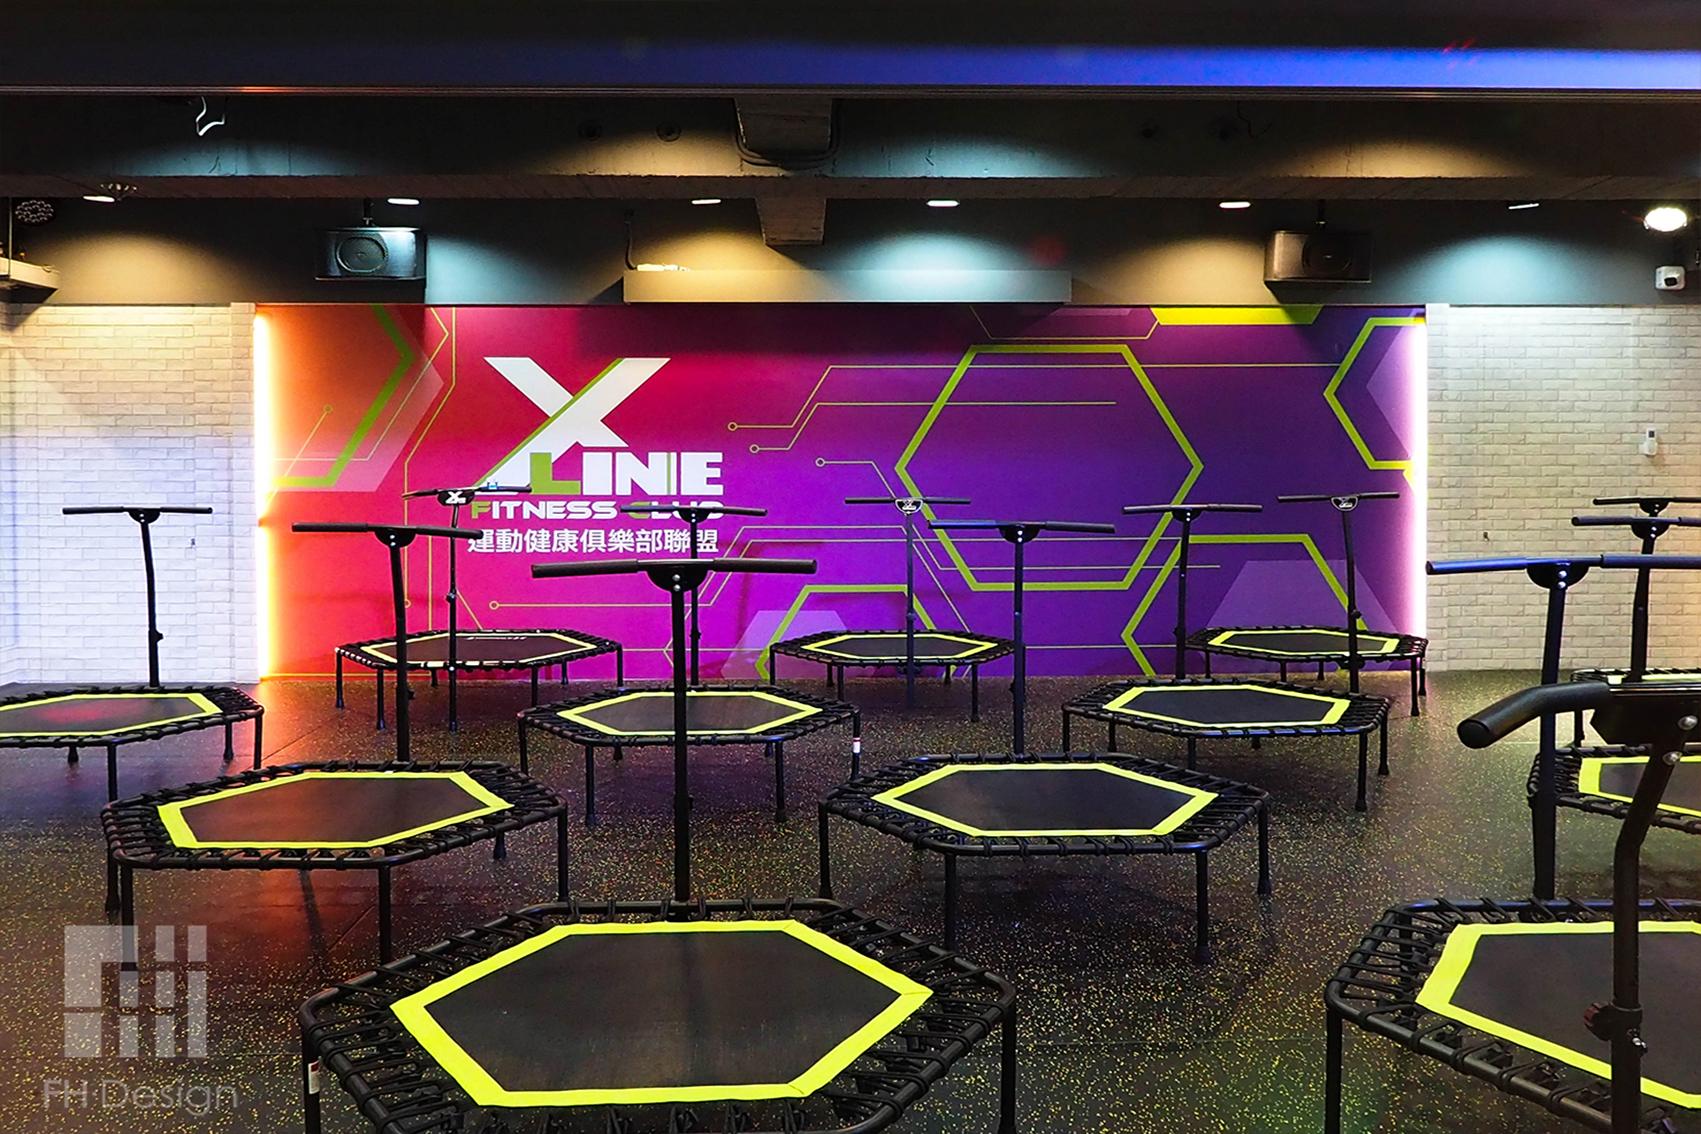 X-Line運動健身俱樂部-街頭漫步